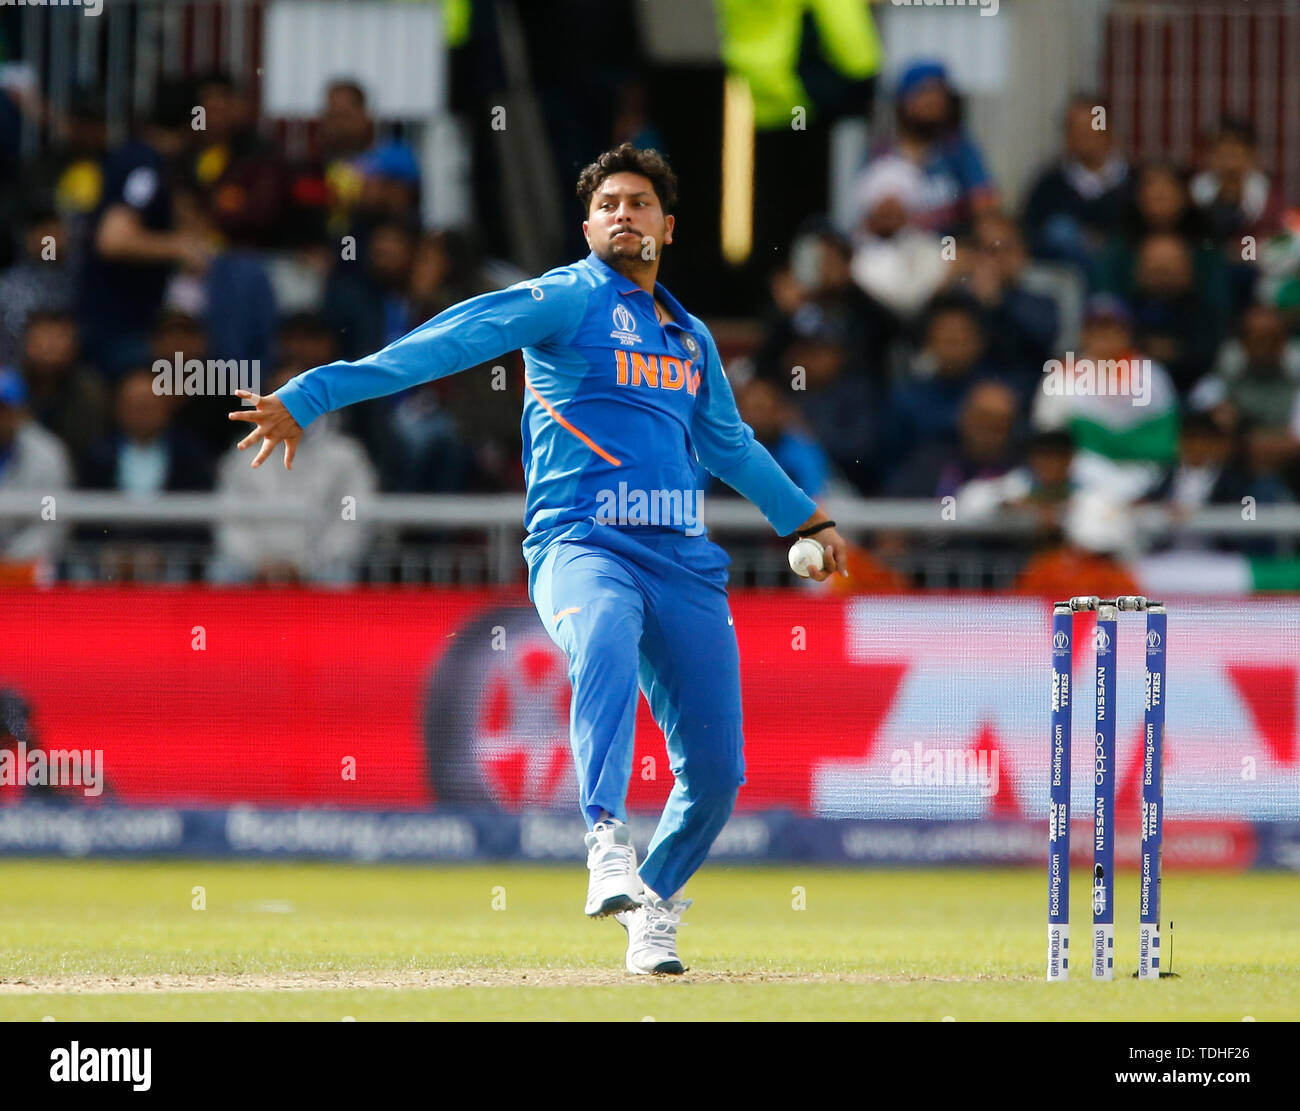 Pakistan India Cricket Stock Photos & Pakistan India Cricket